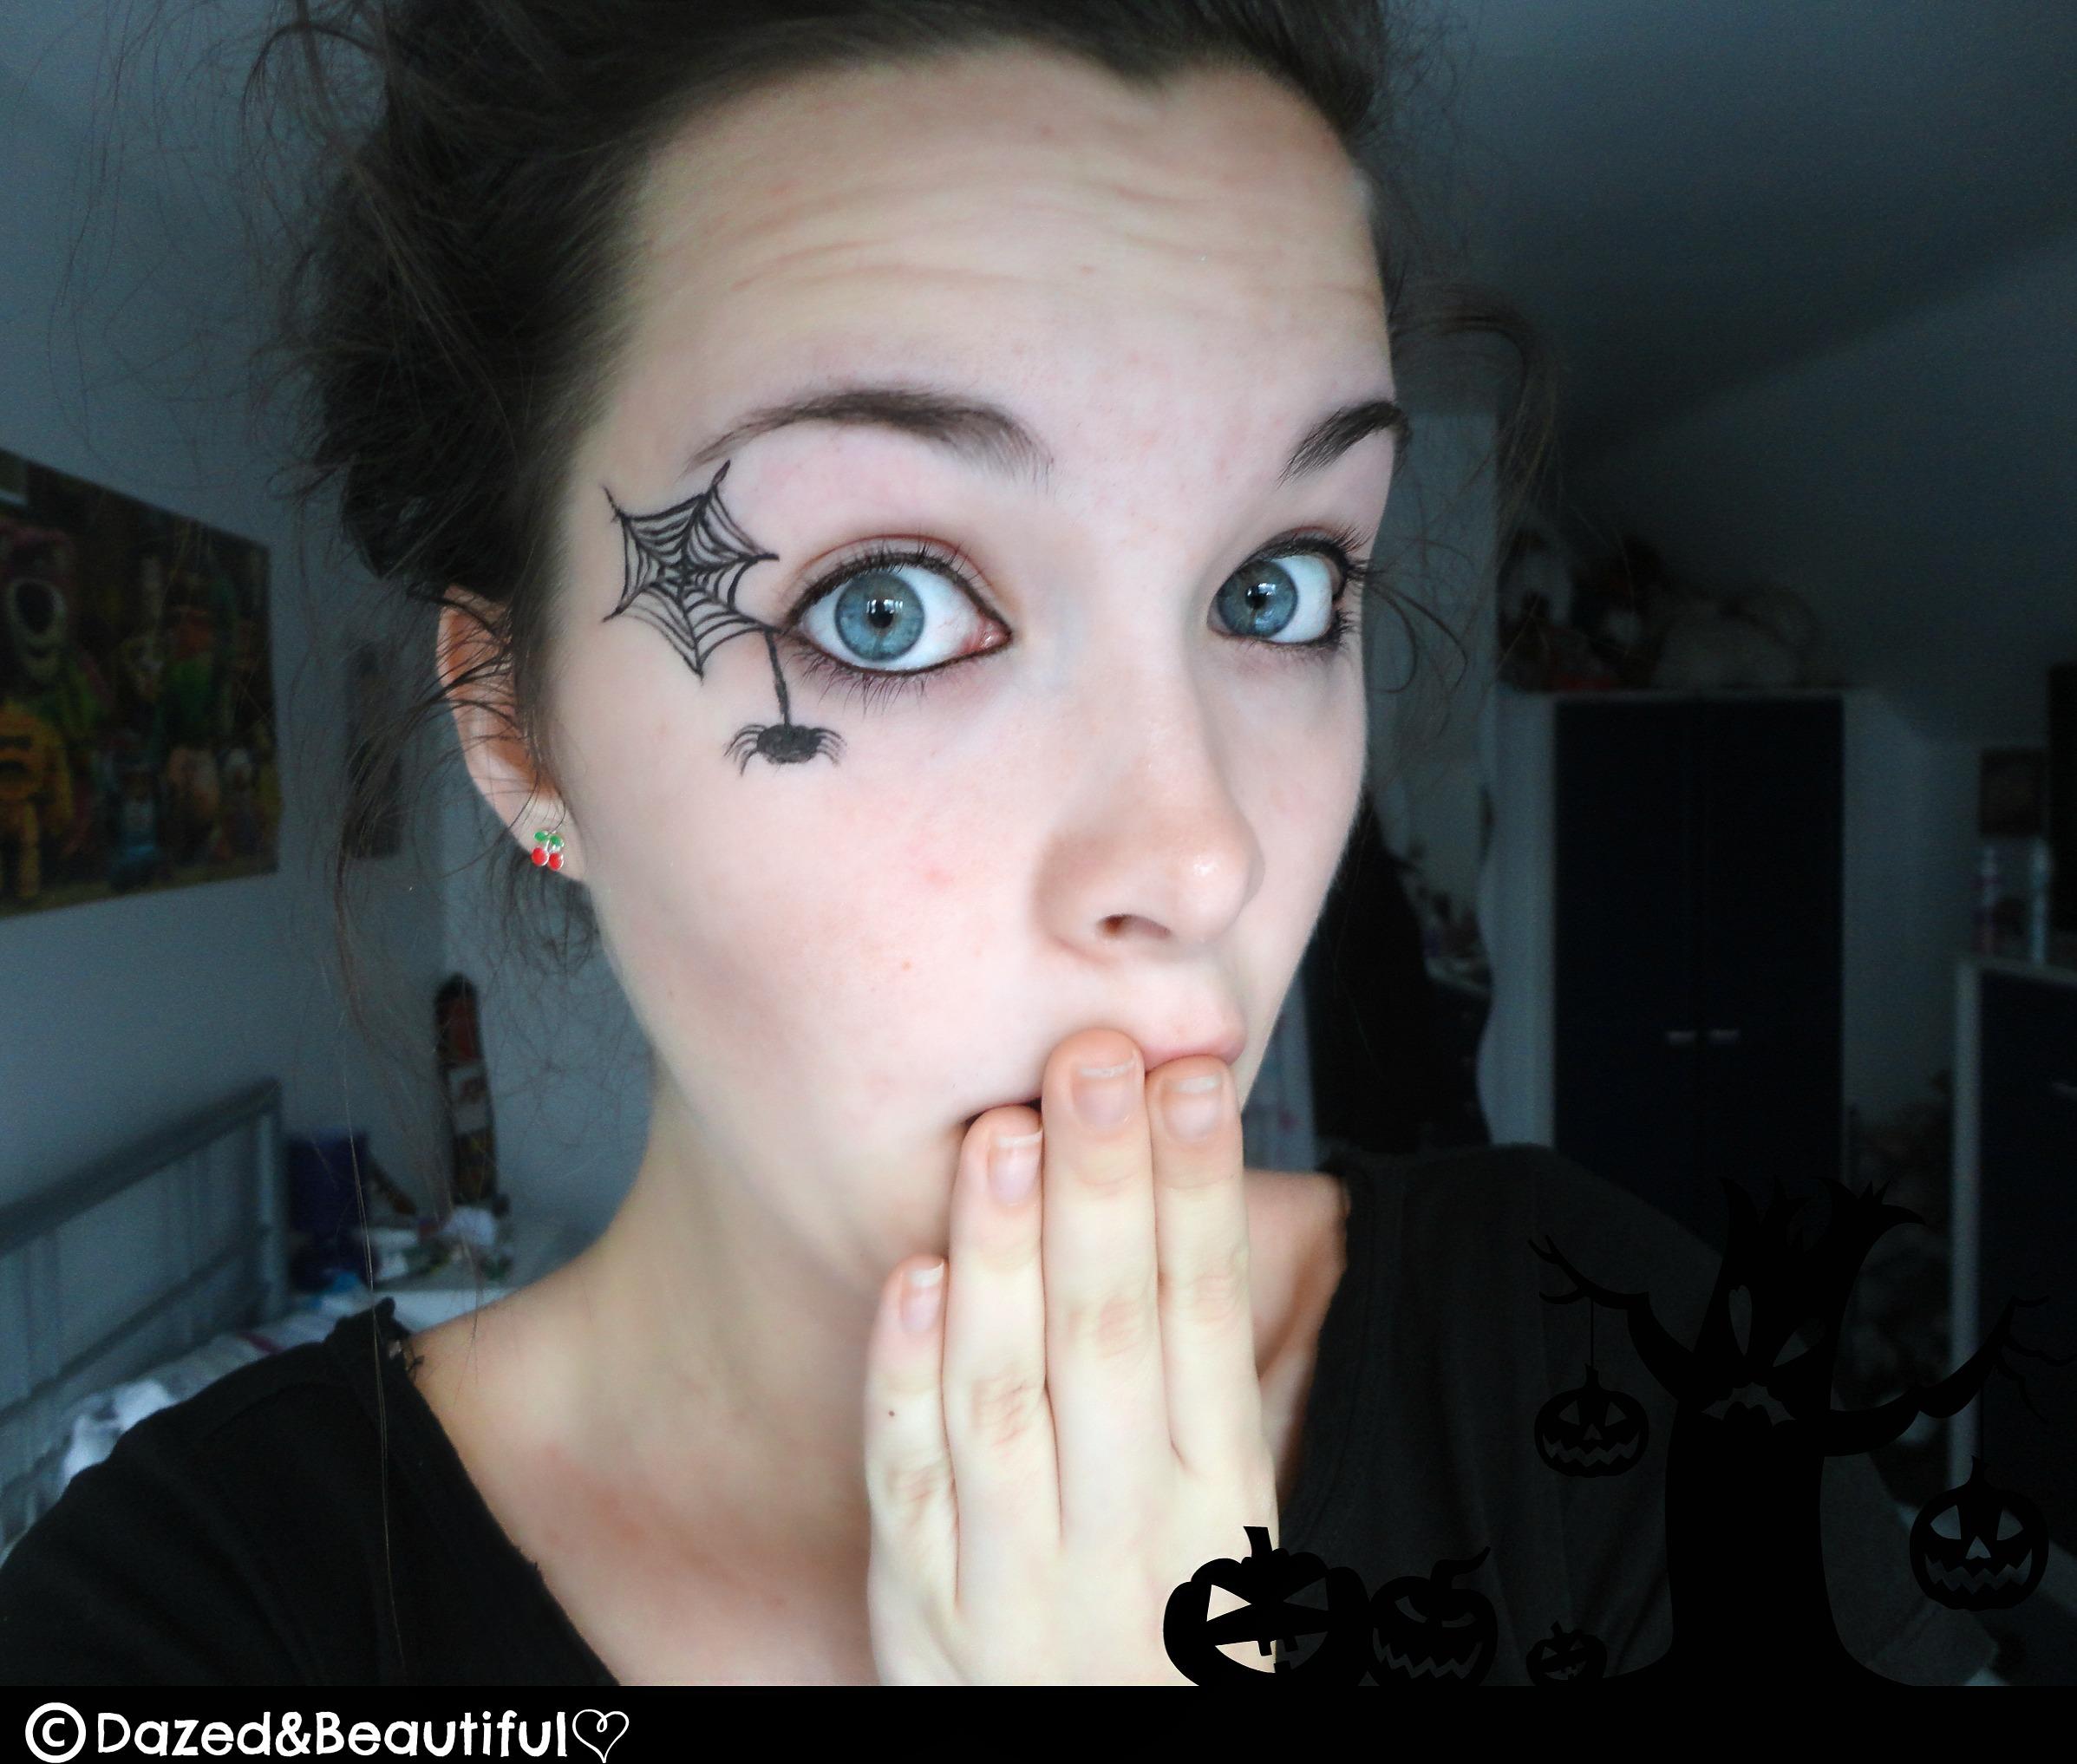 spiderweb Dazed&ampBeautiful - Cute Easy Makeup